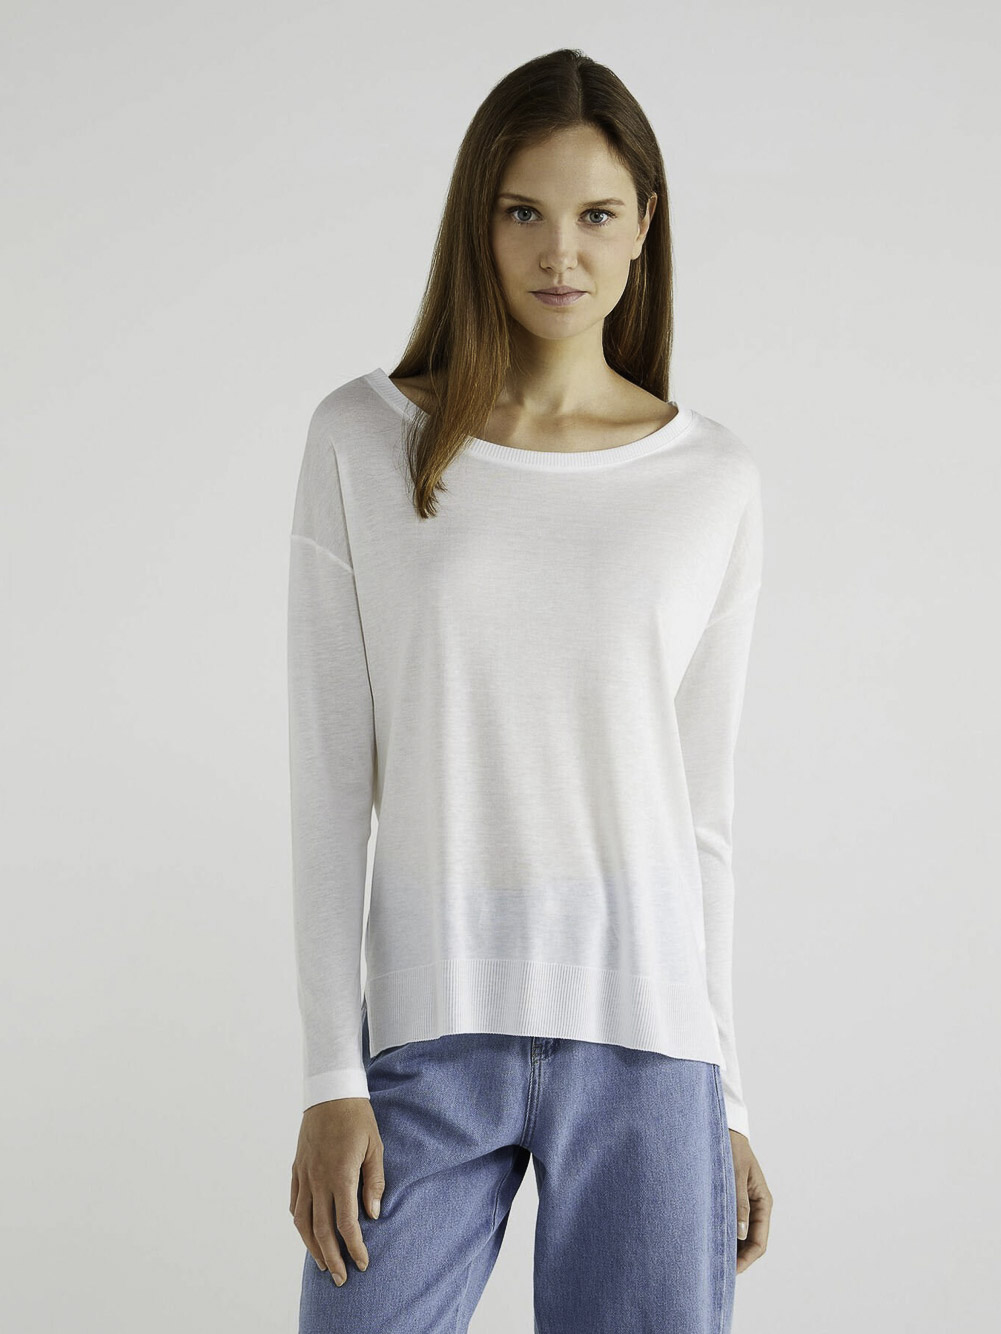 BENETTON T-shirt μακρυμάνικο από lyocell 3ACRE11E6 20A074